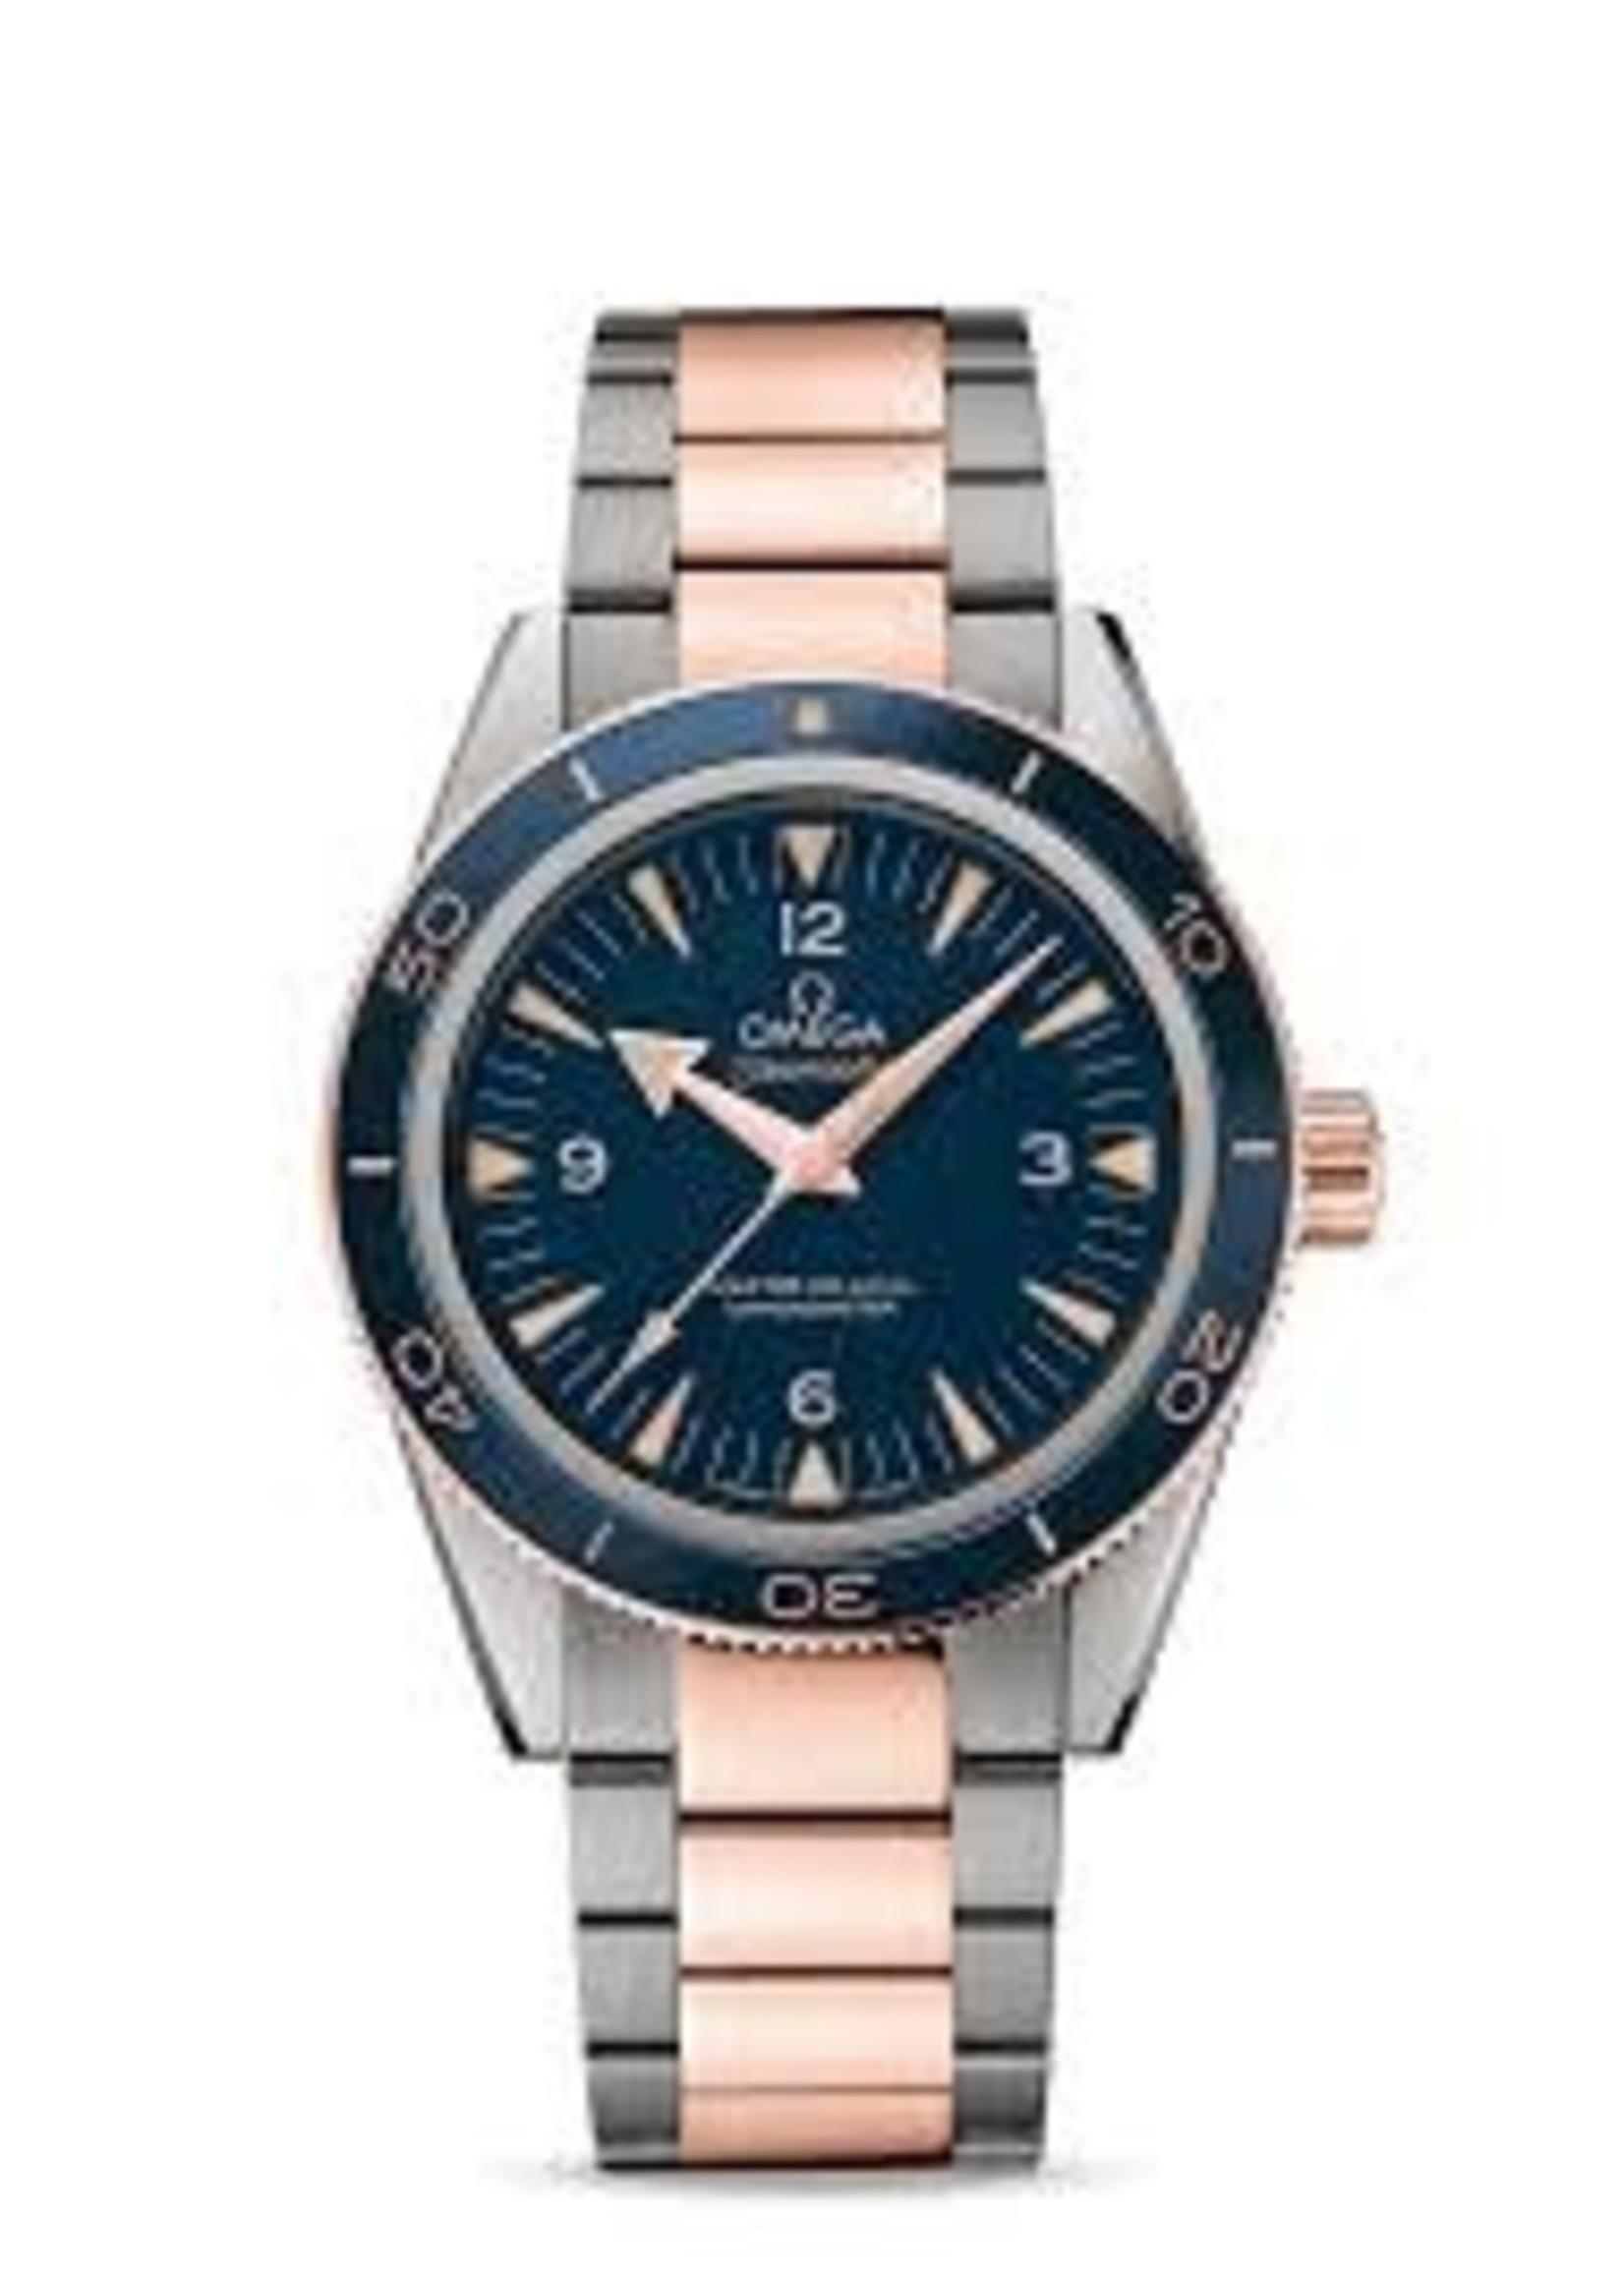 Omega Watches OMEGA SEAMASTER (2020 B+P) #23360412103001